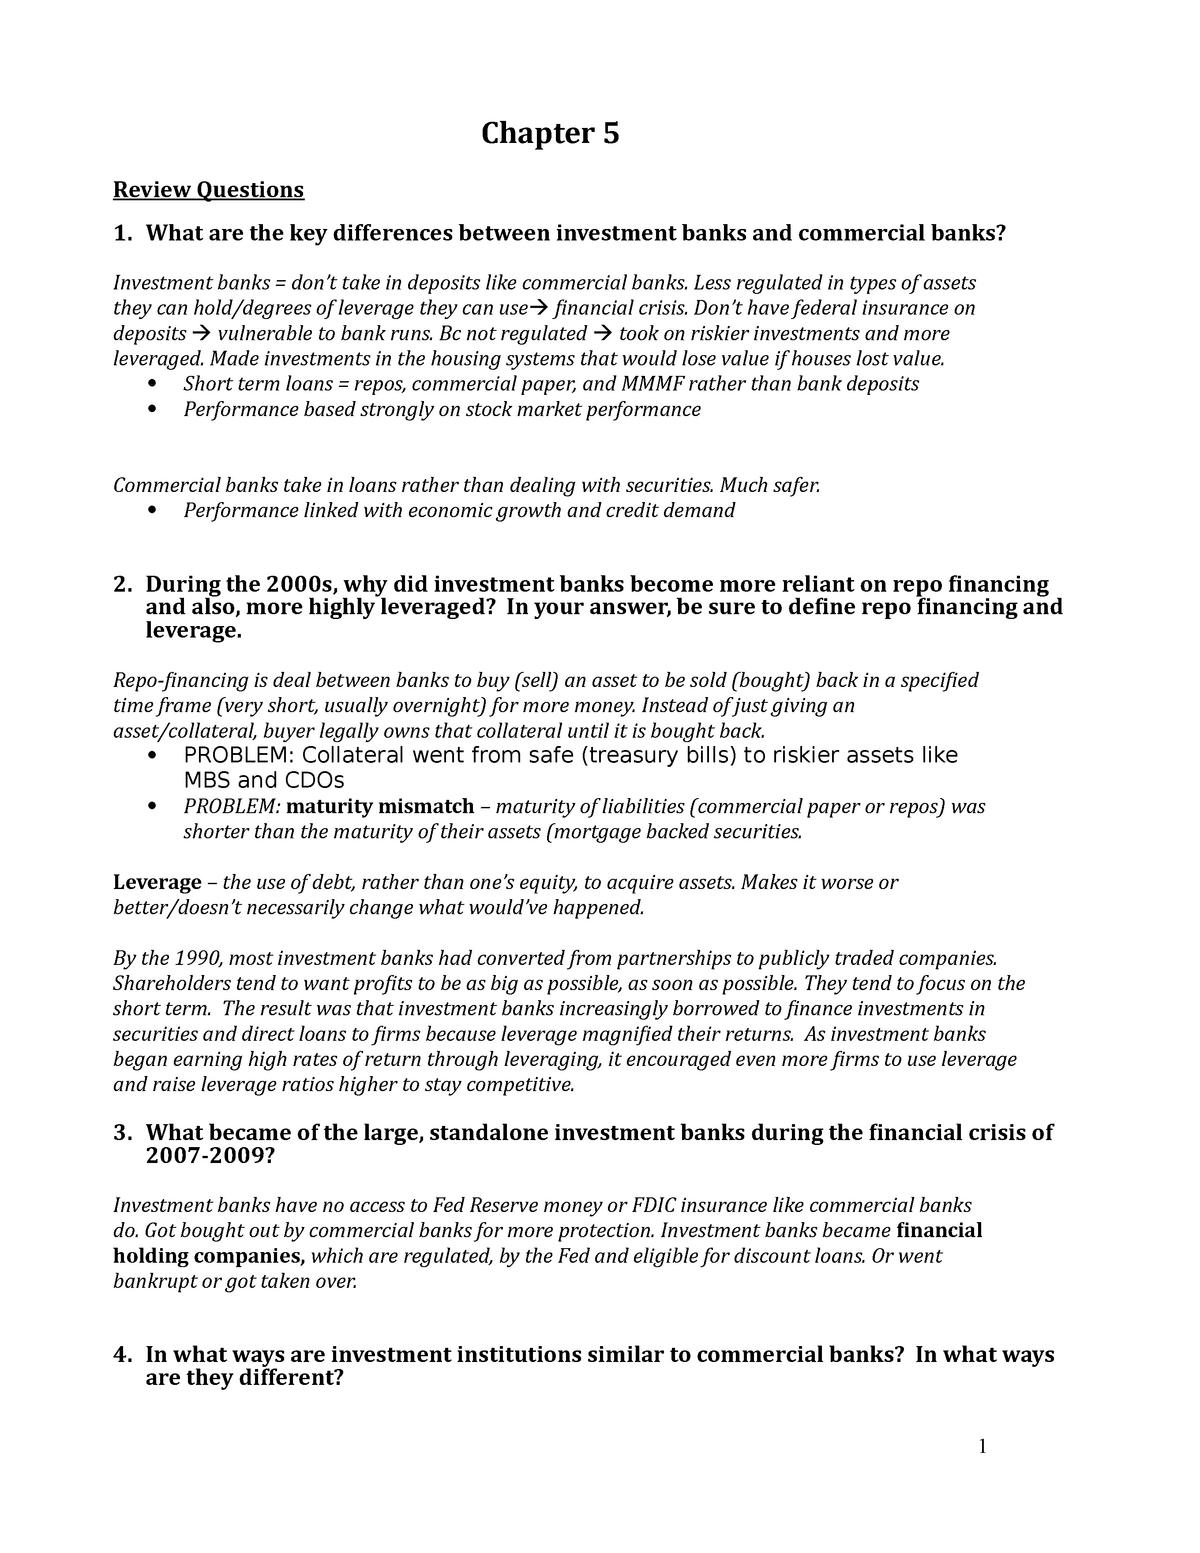 Financial Markets Chapter 5 Questions - FIN 3244: Financial